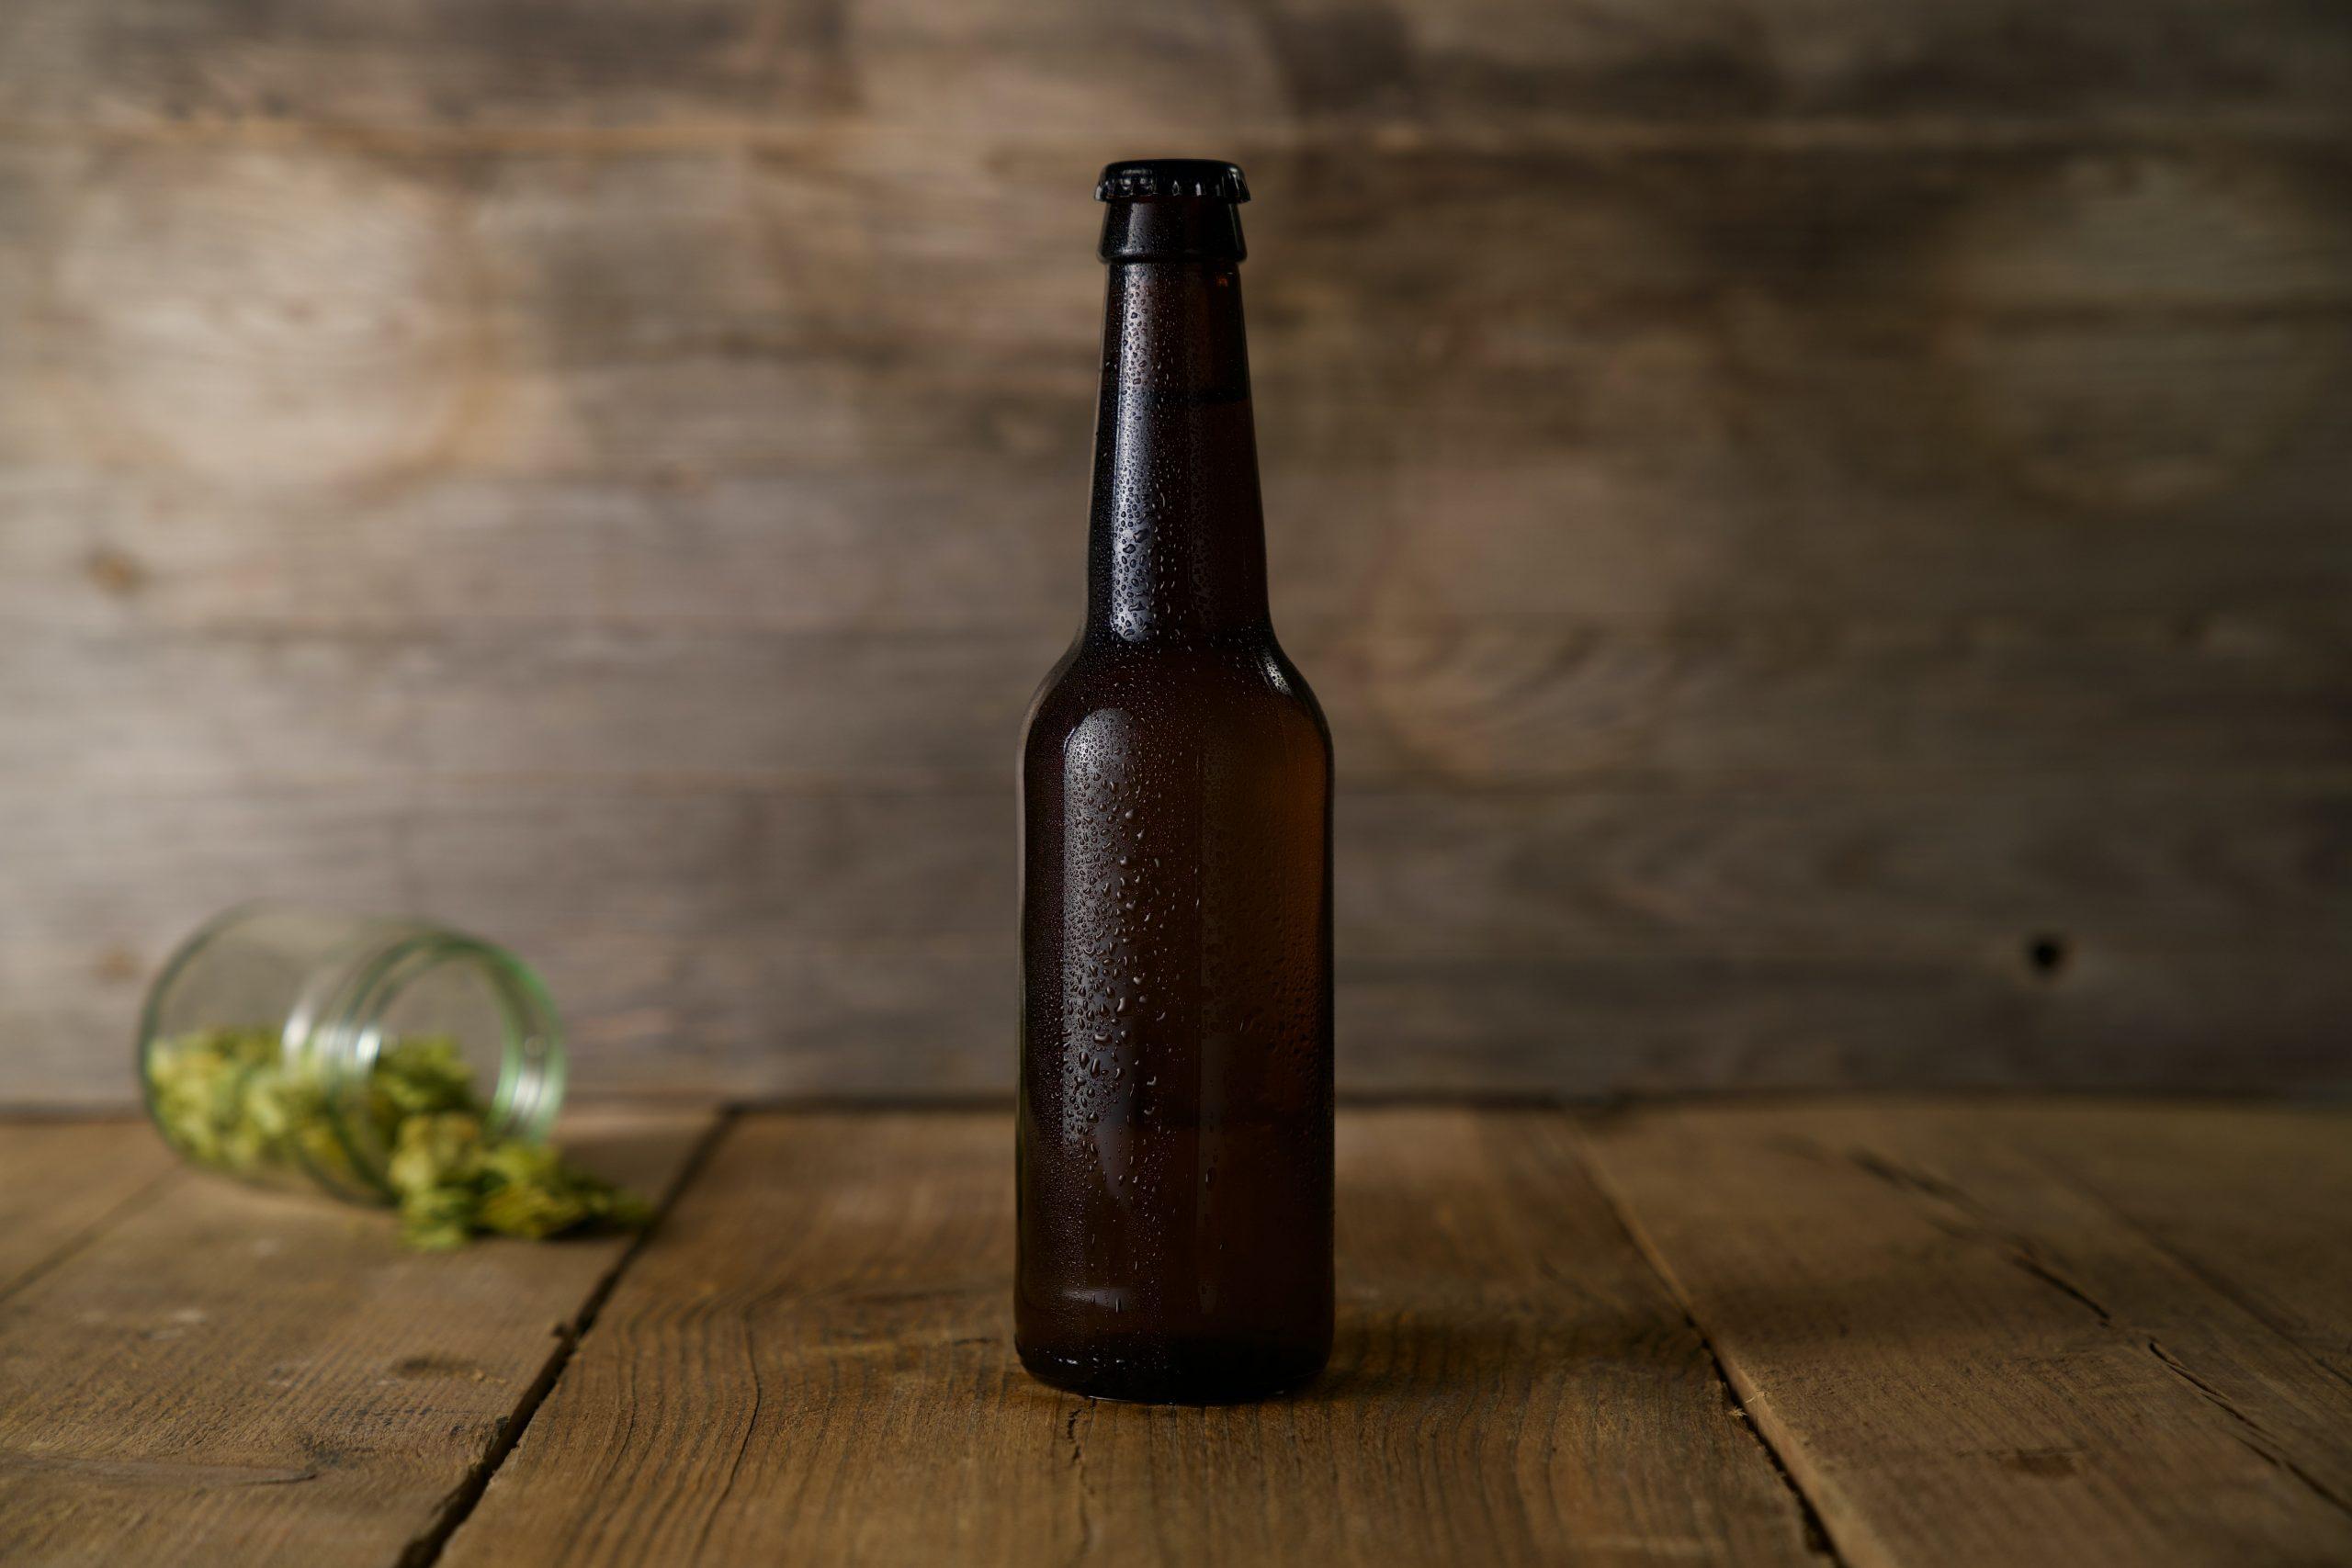 Home brewed beer in a bottle